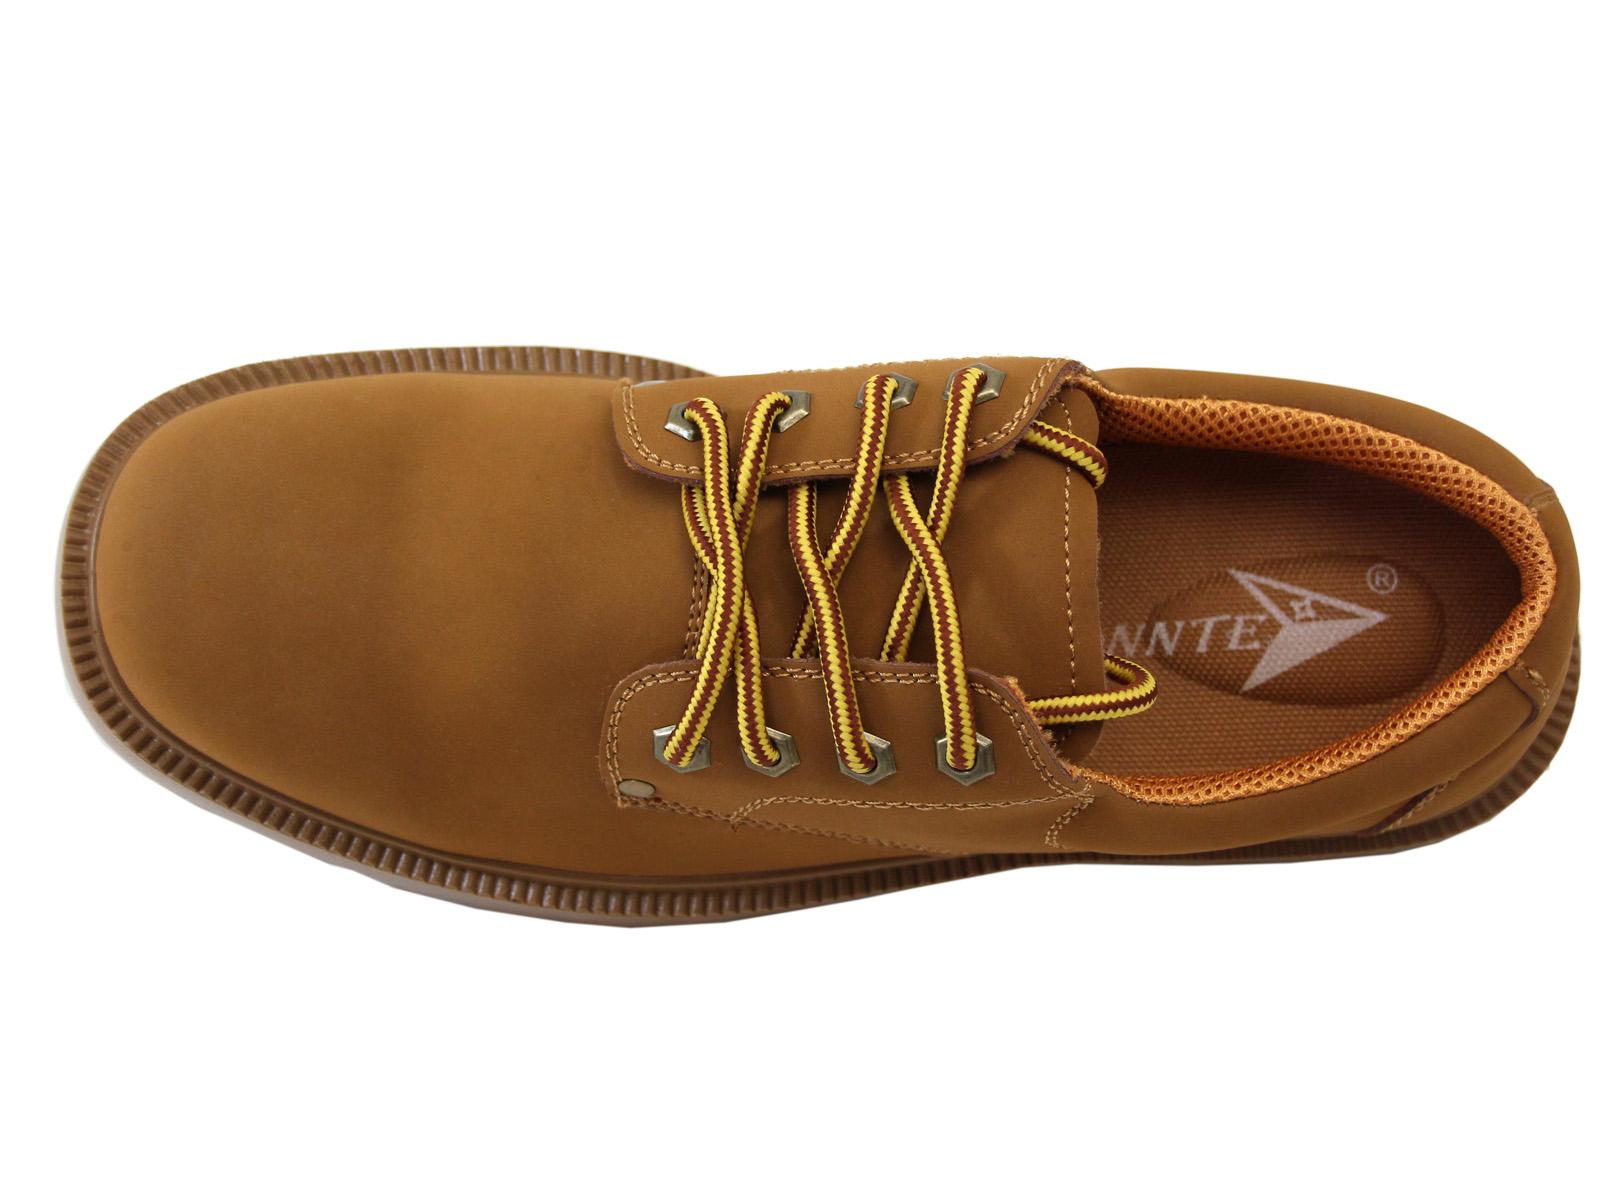 Tenacity, Annte Shoes